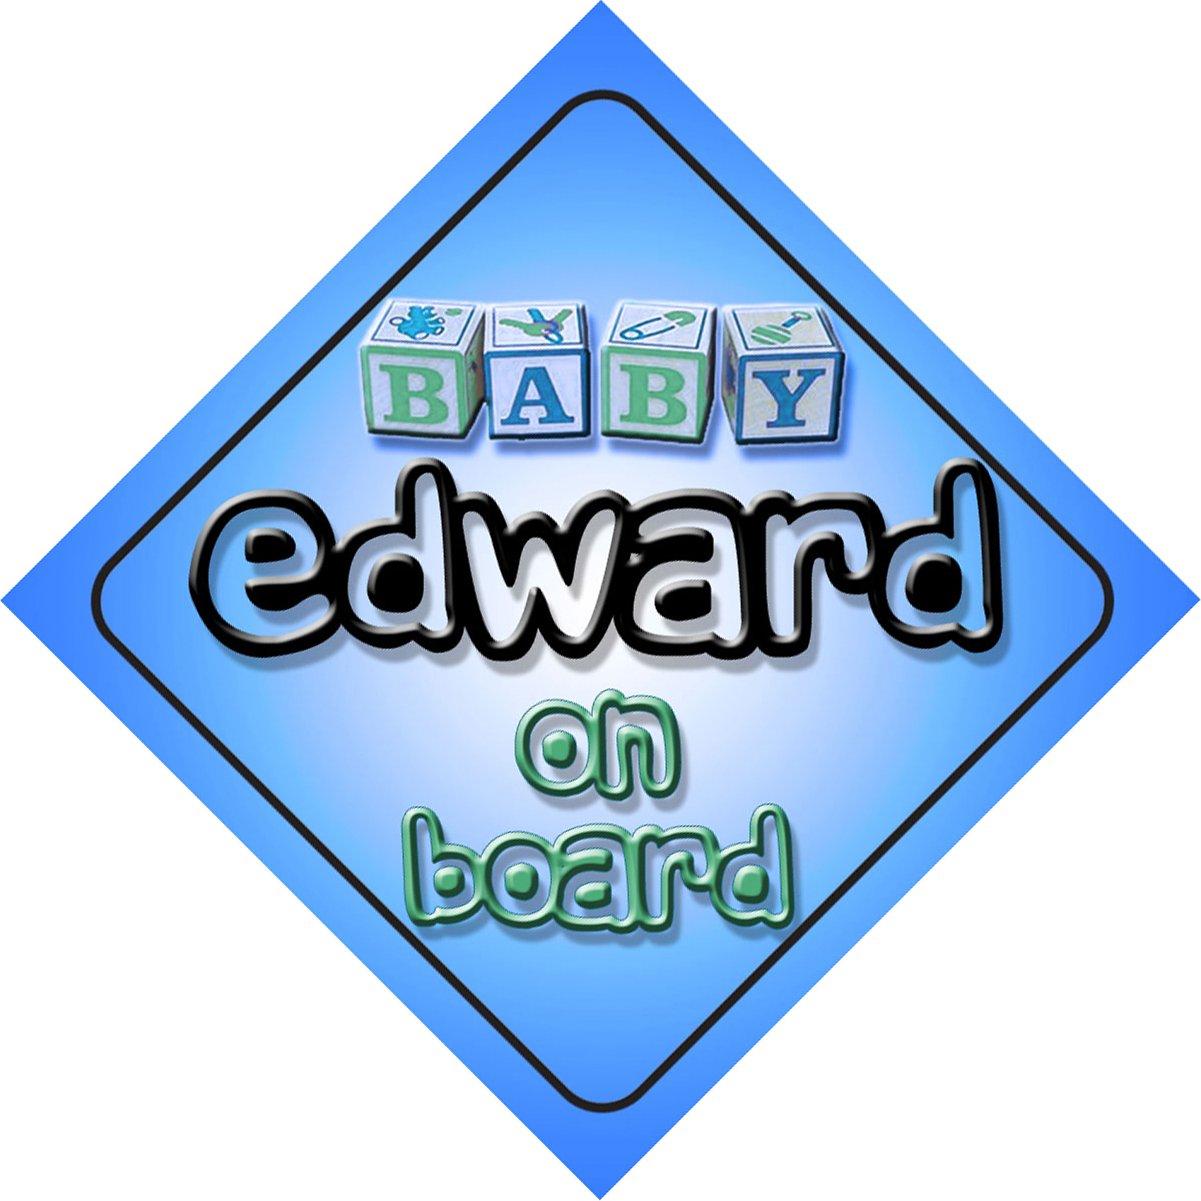 Baby Boy Edward on board novelty car sign gift / present for new child / newborn baby Quality Goods Ltd